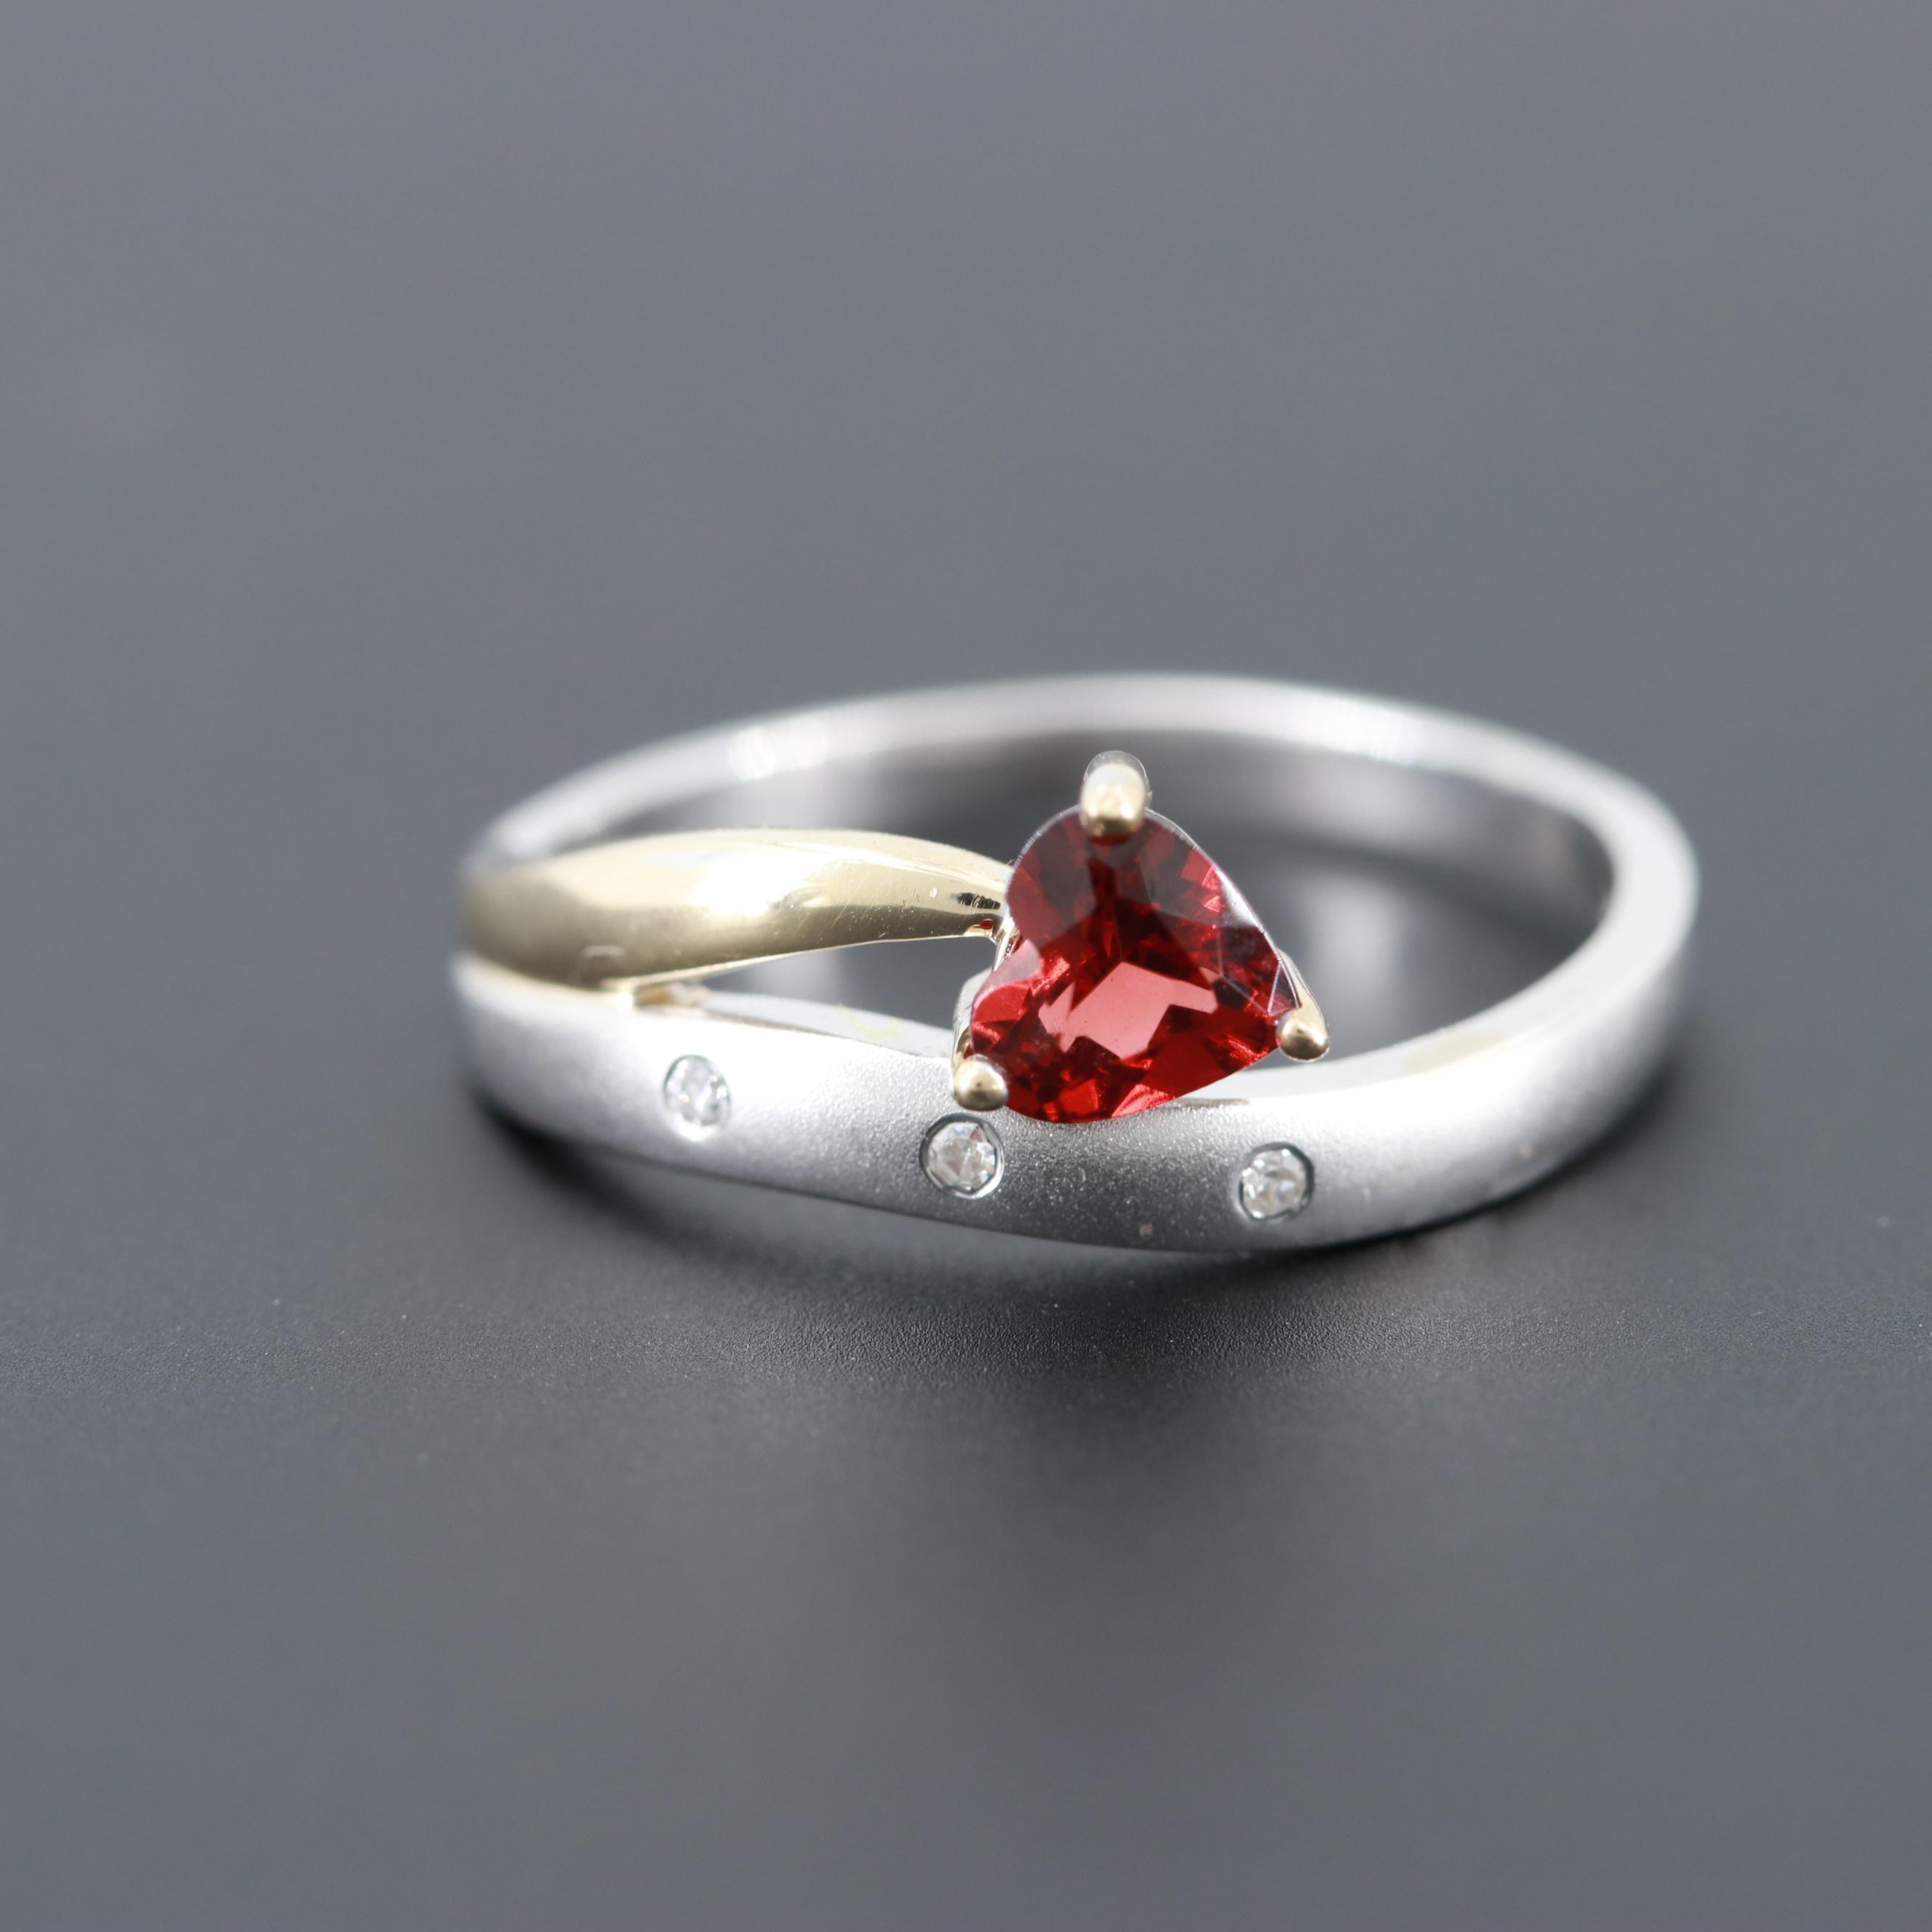 10K Yellow and White Gold Garnet and Diamond Ring